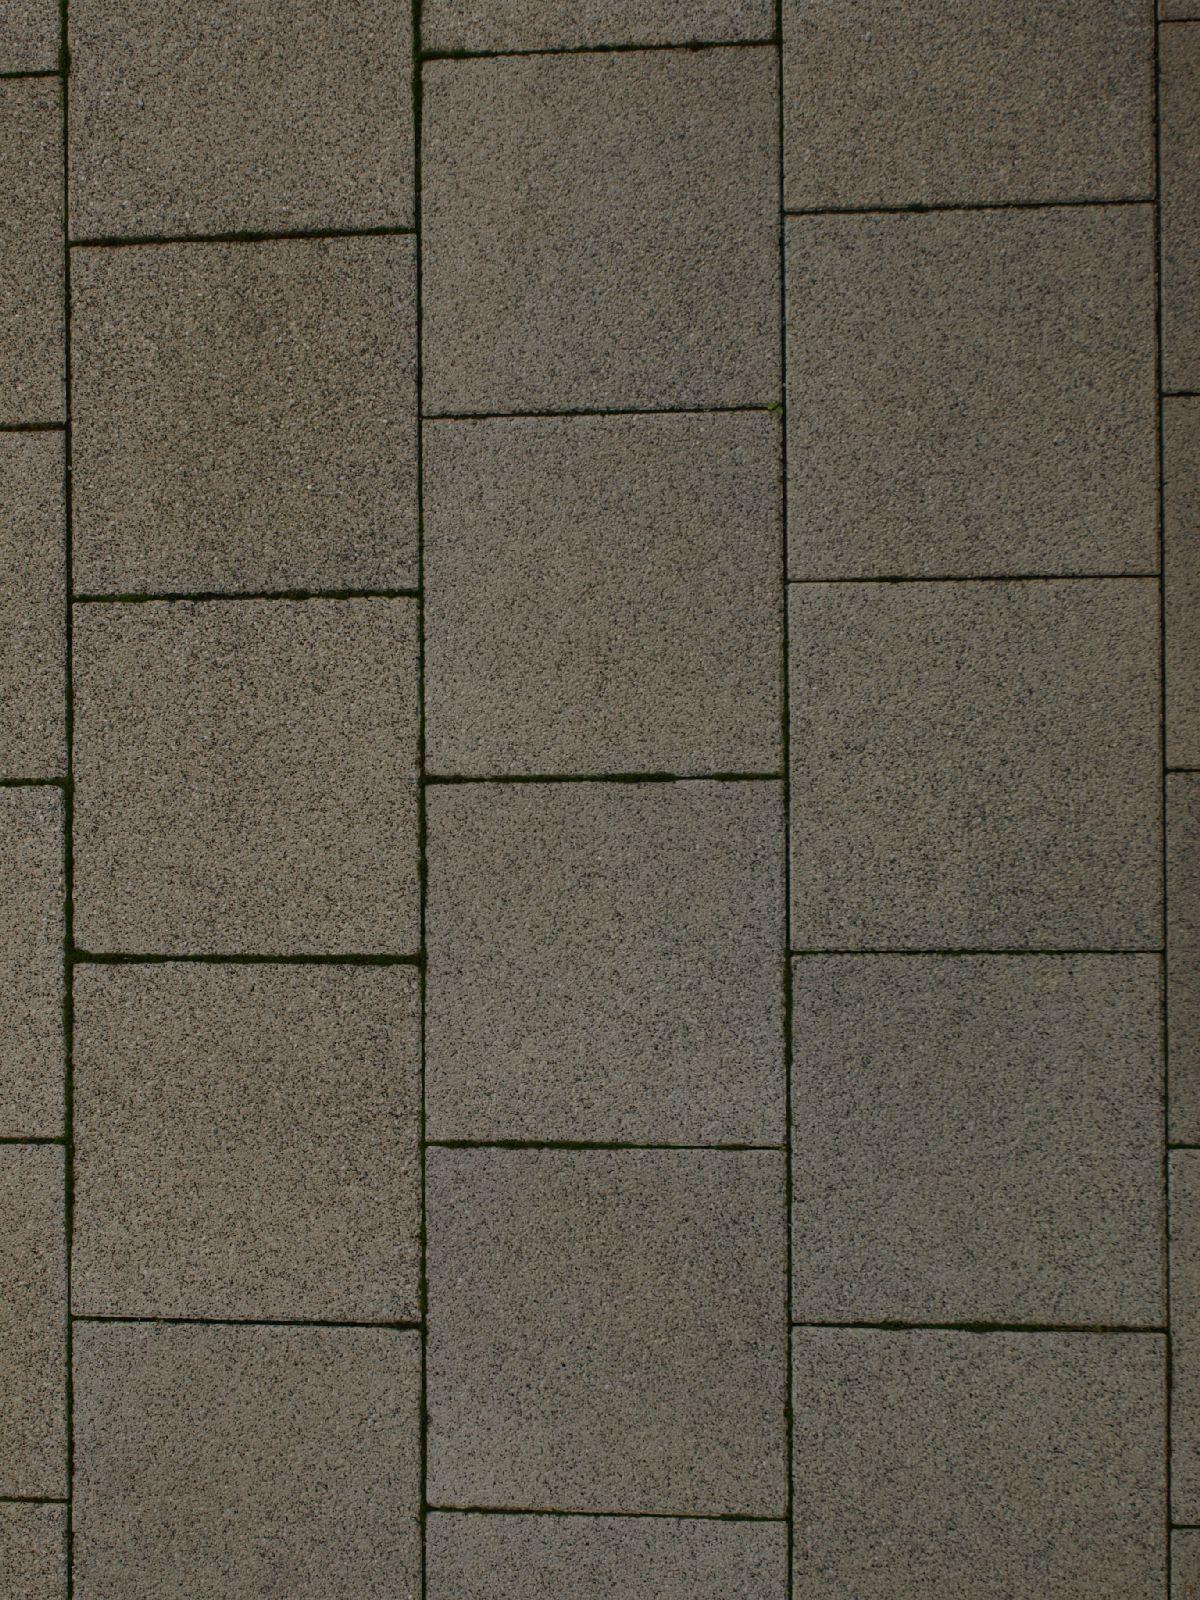 Ground-Urban_Texture_A_PC011373